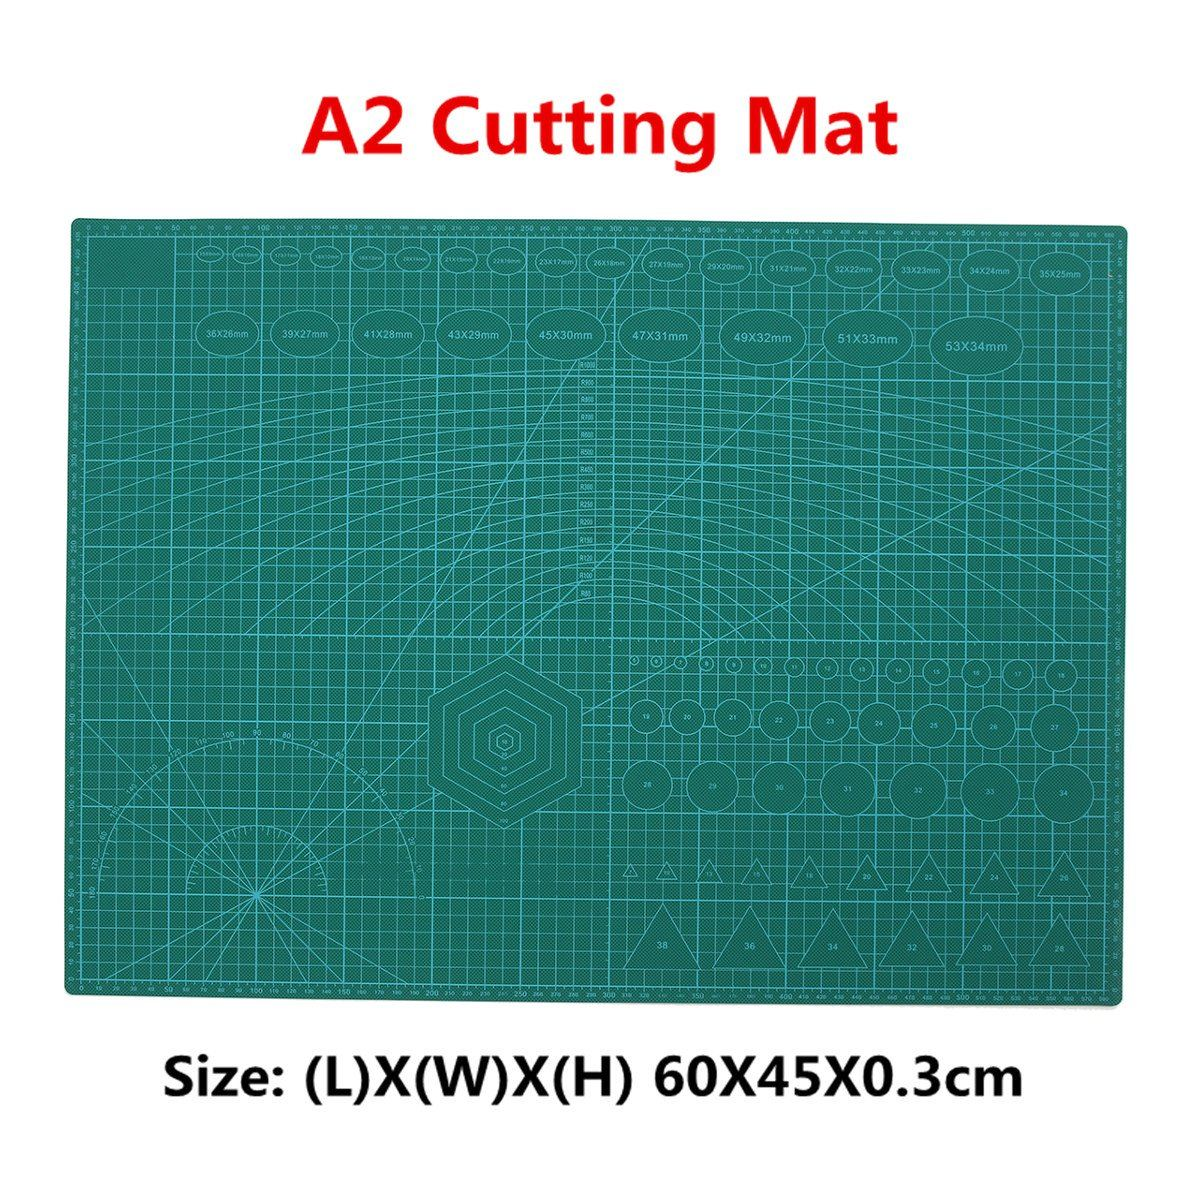 A2 pvc tapete de corte almofada de corte retalhos dupla impresso auto cura corte esteira artesanato acolchoado scrapbooking placa 45x60 cm 3mm